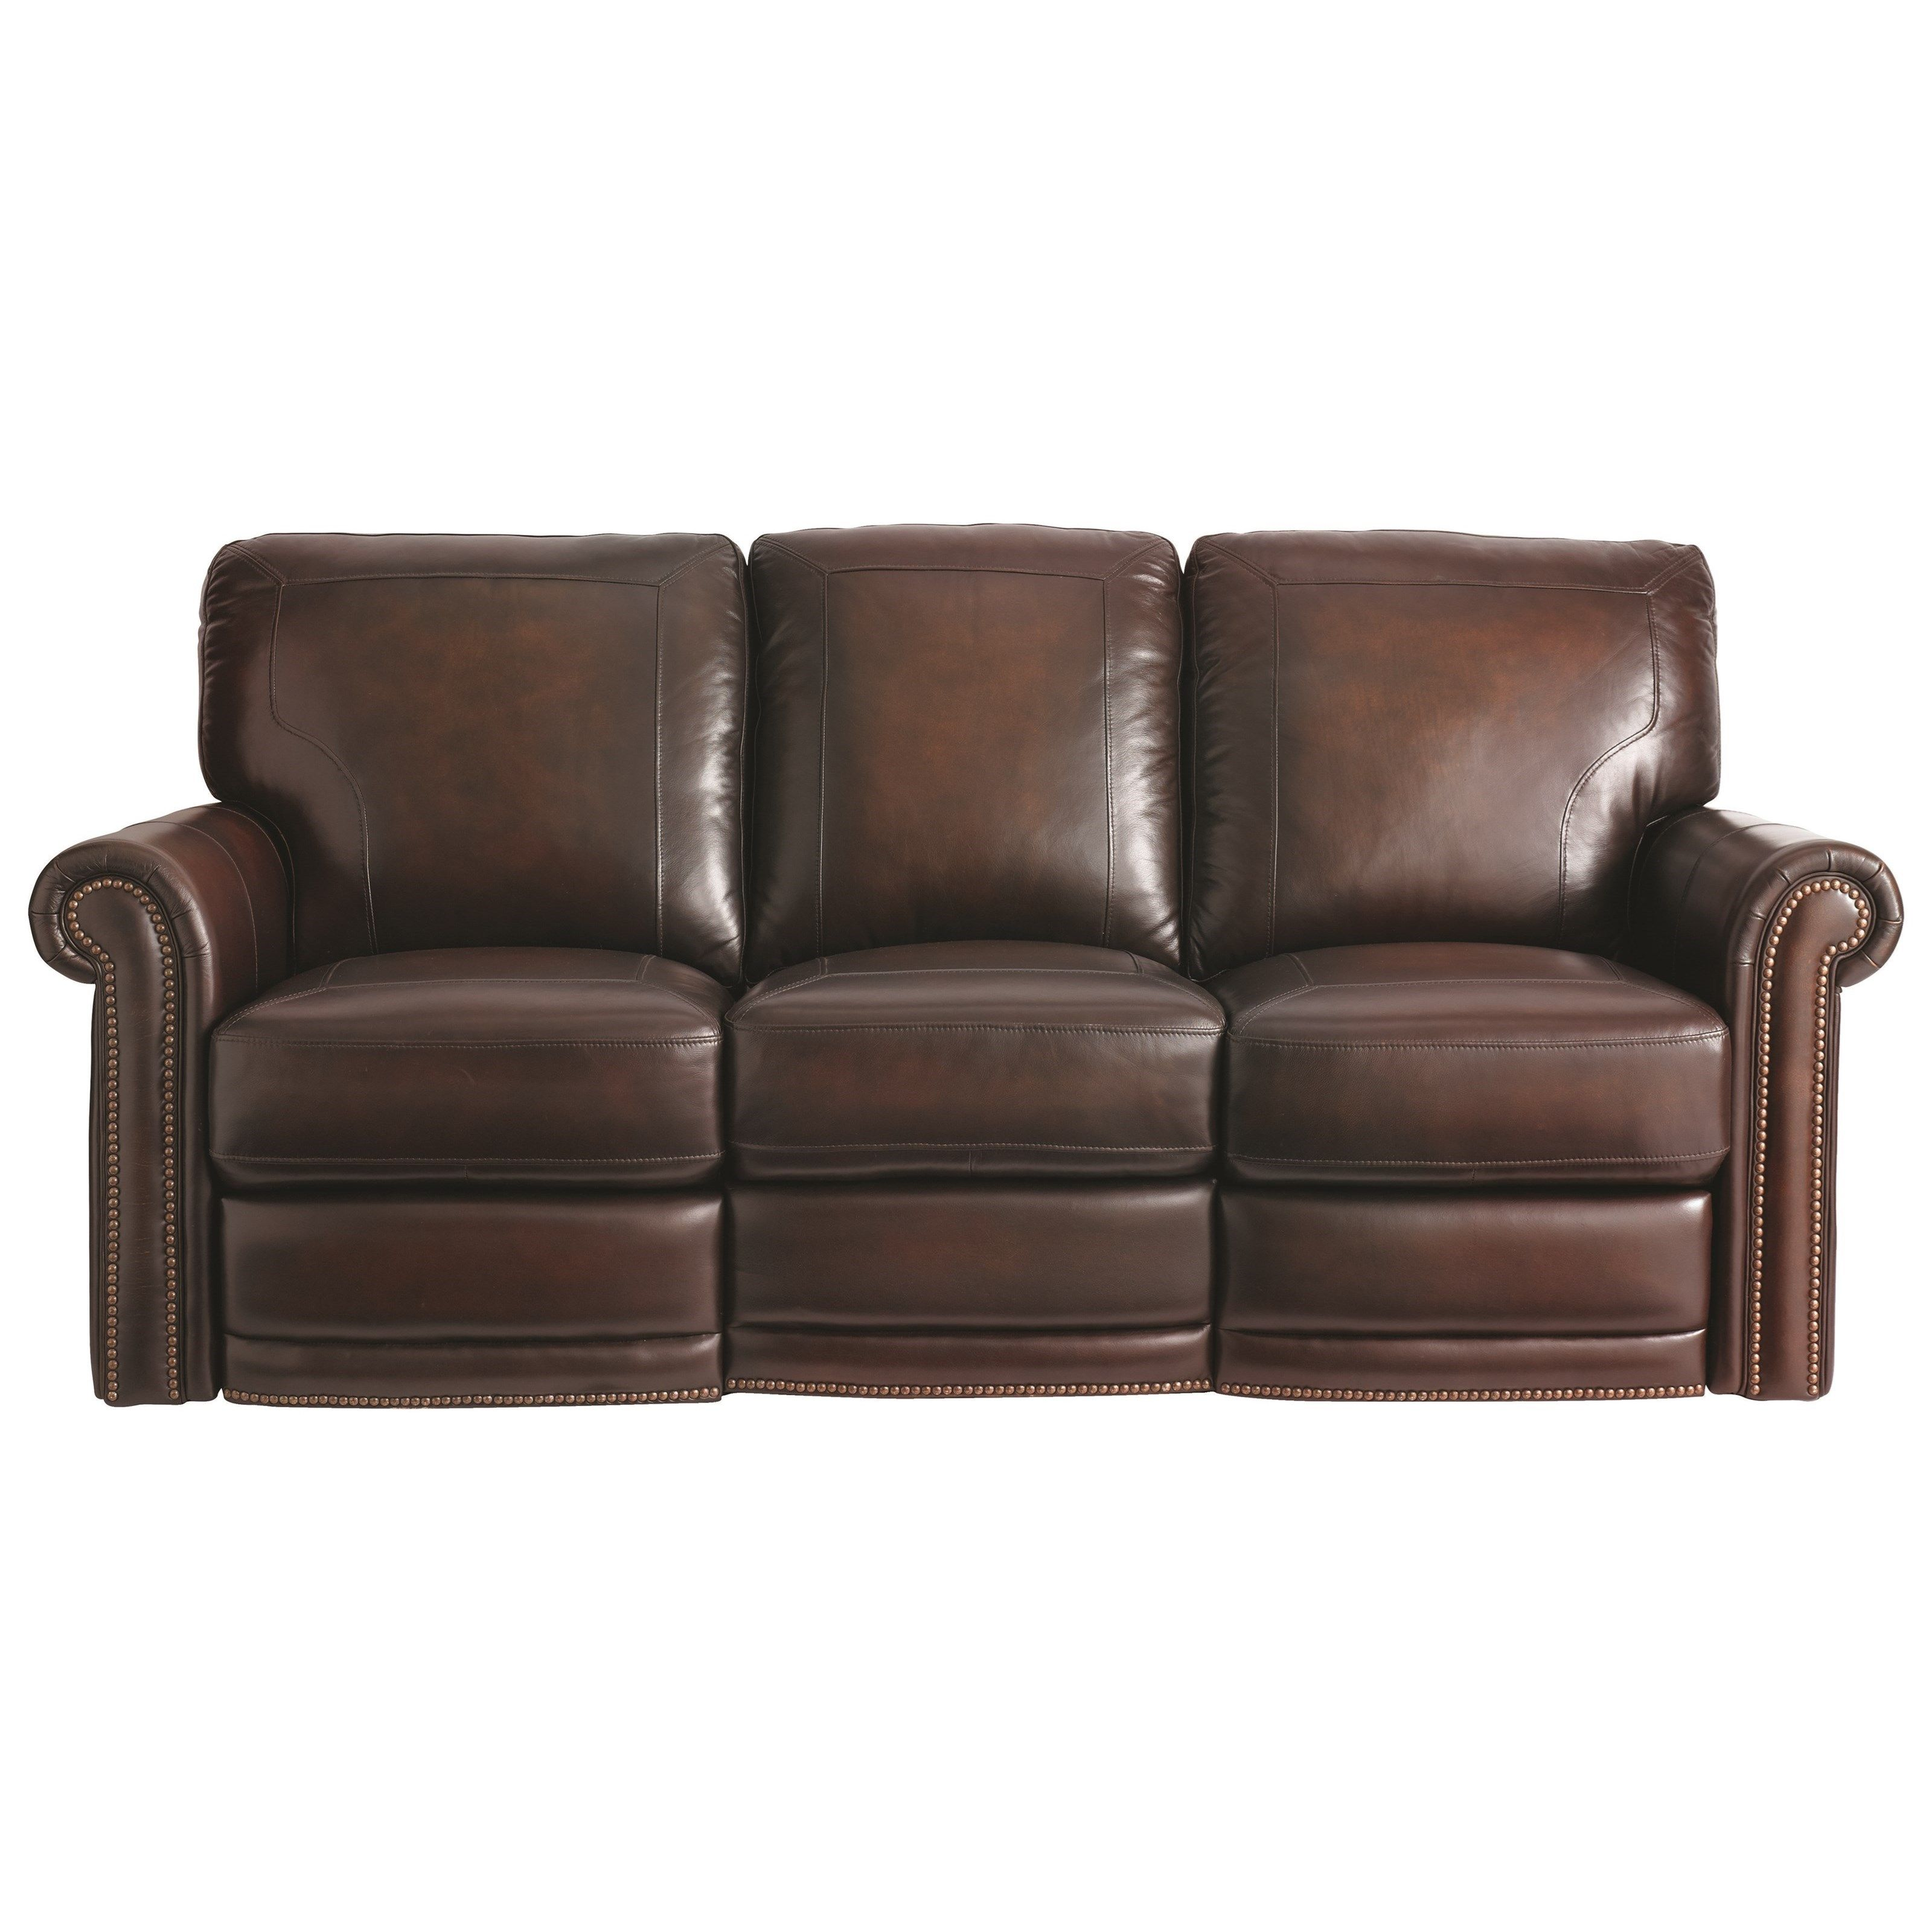 hamilton 3958 power reclining sofa by bassett at darvin furniture rh pinterest cl